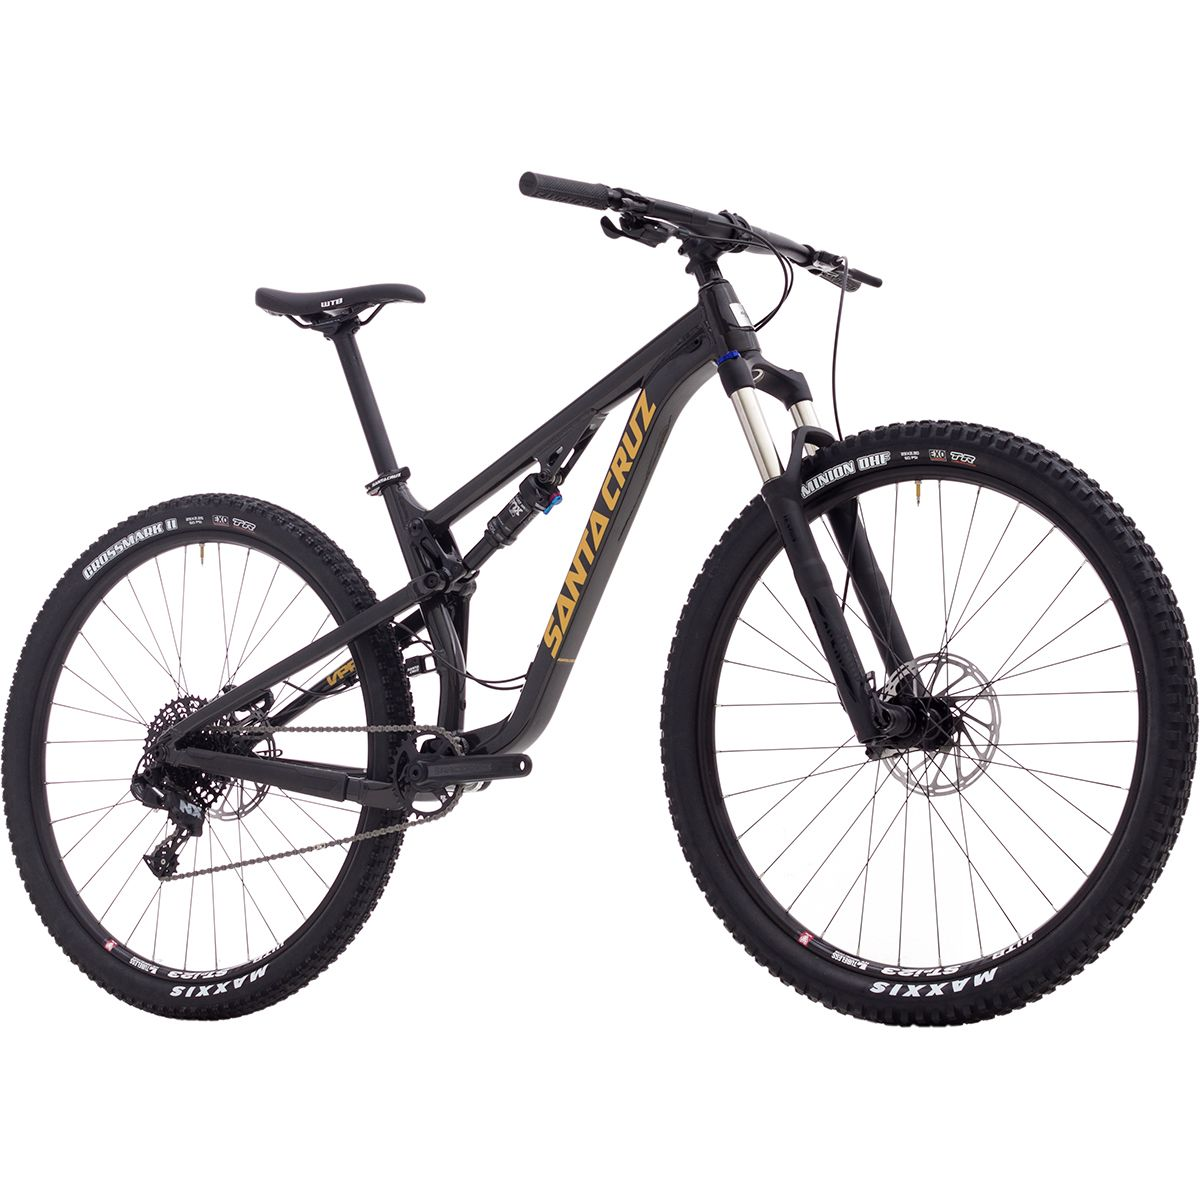 Santa Cruz Bicycles Tallboy 29 D Complete Mountain Bike - 2018 ...